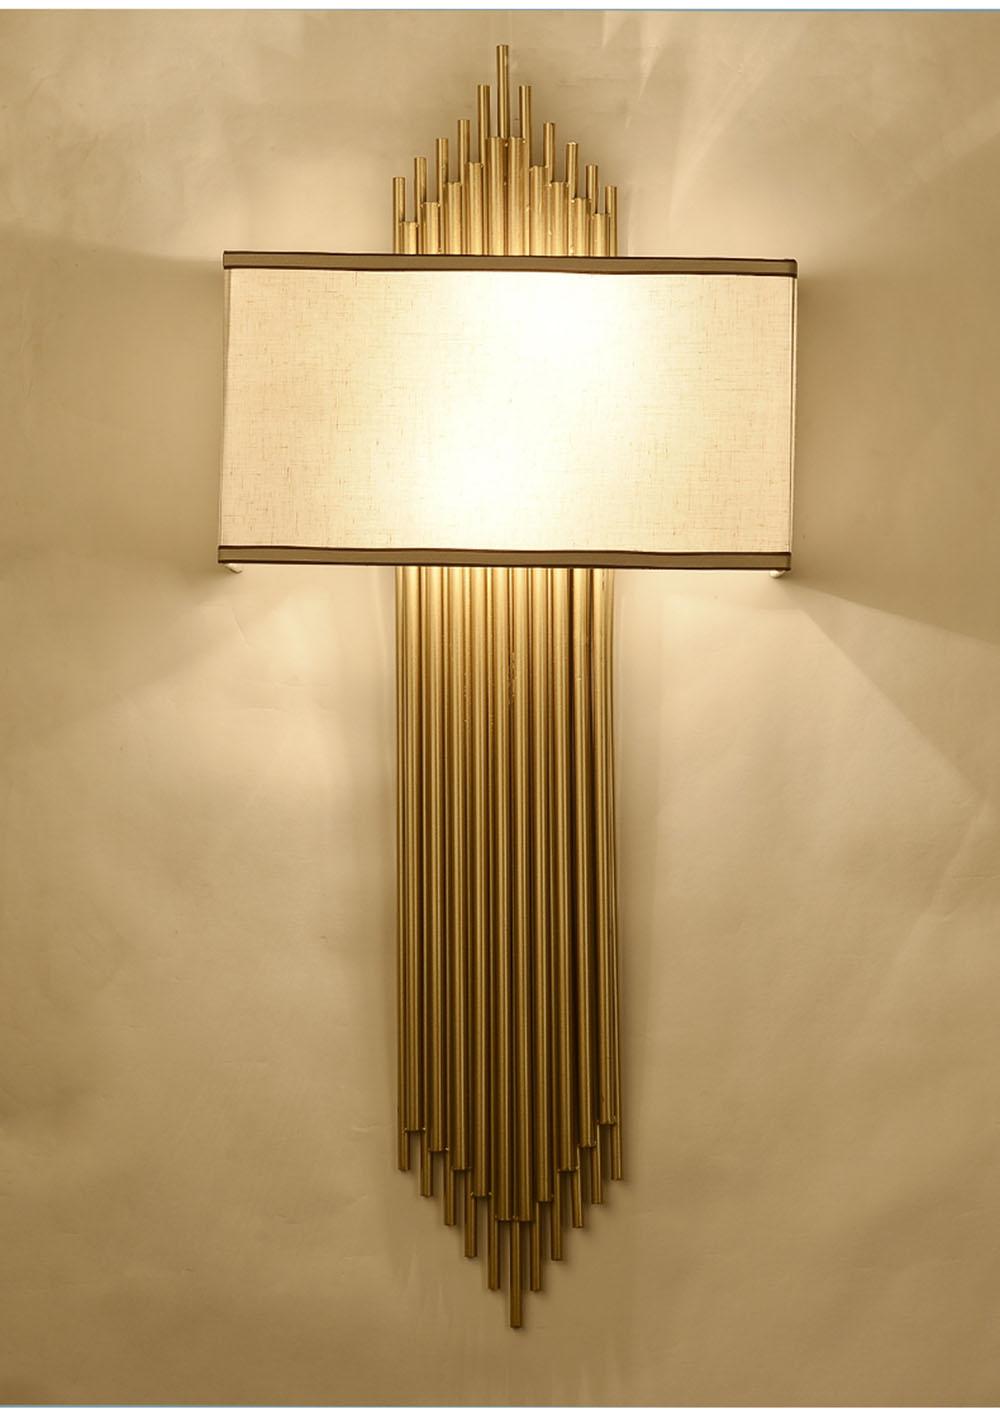 New Chinese LED Wall Lamp Living Room Bedroom Bedside Lamp E14 Aisle ...